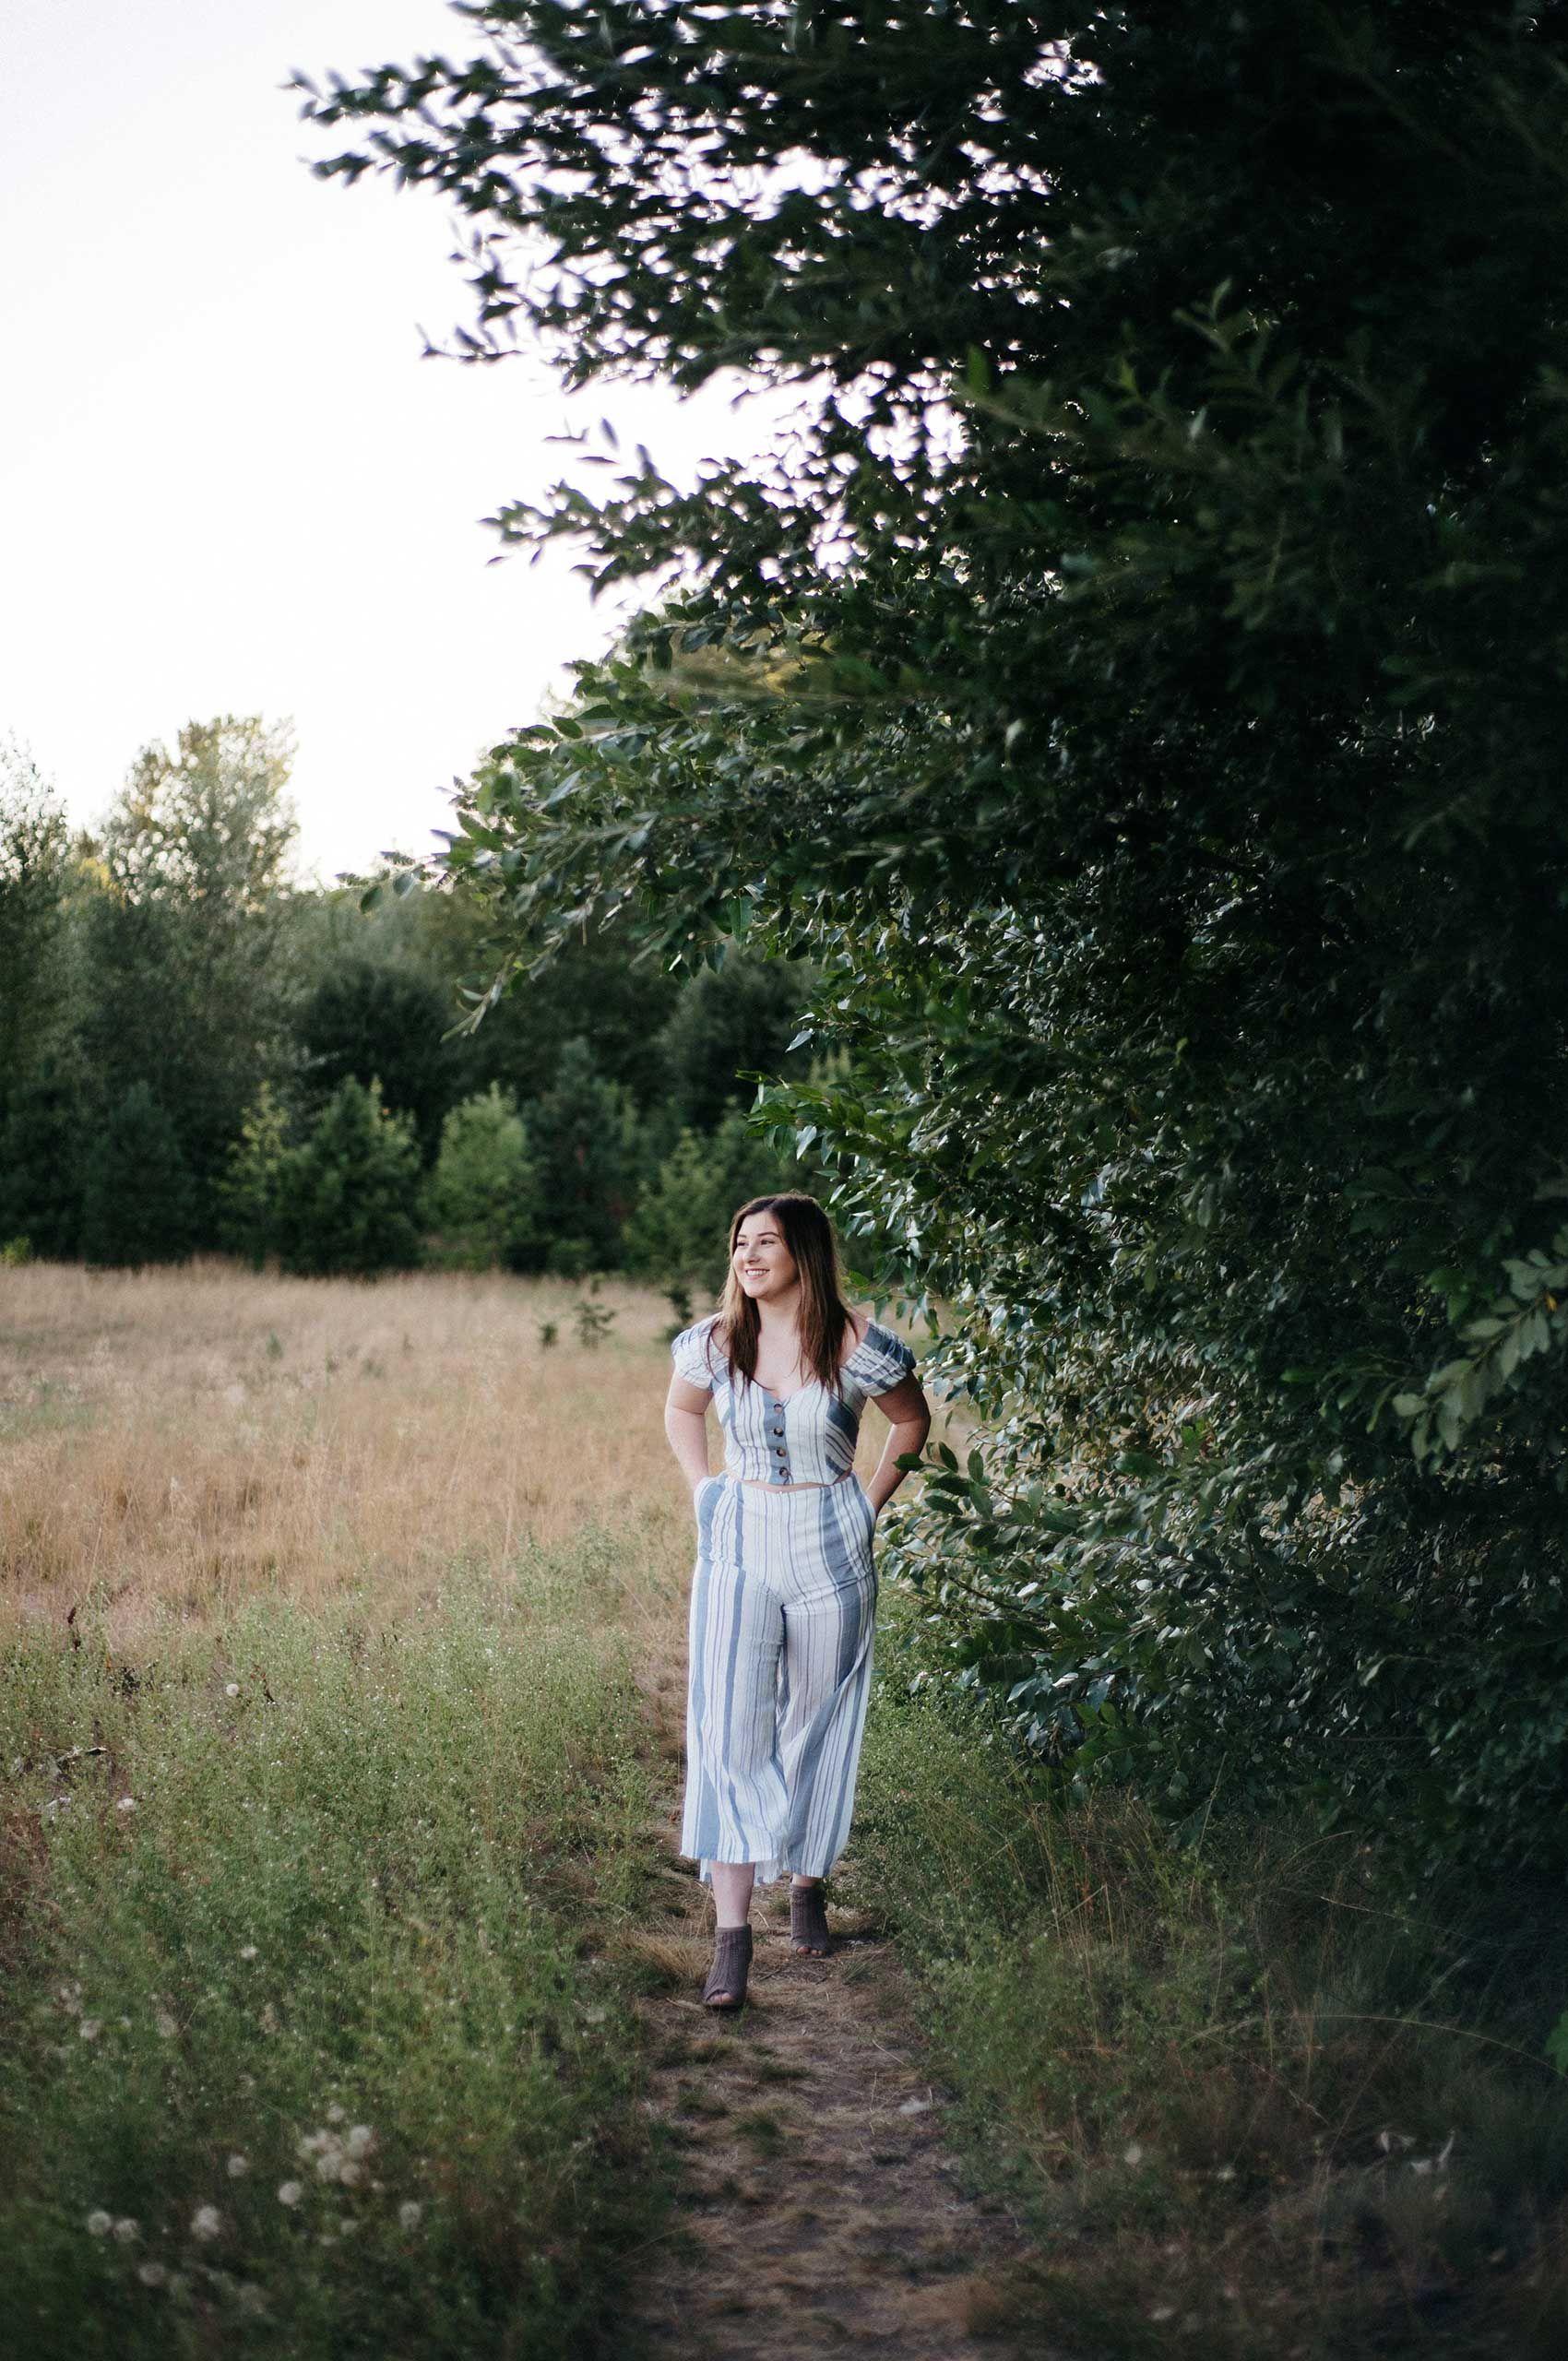 Portraitl2.jpg